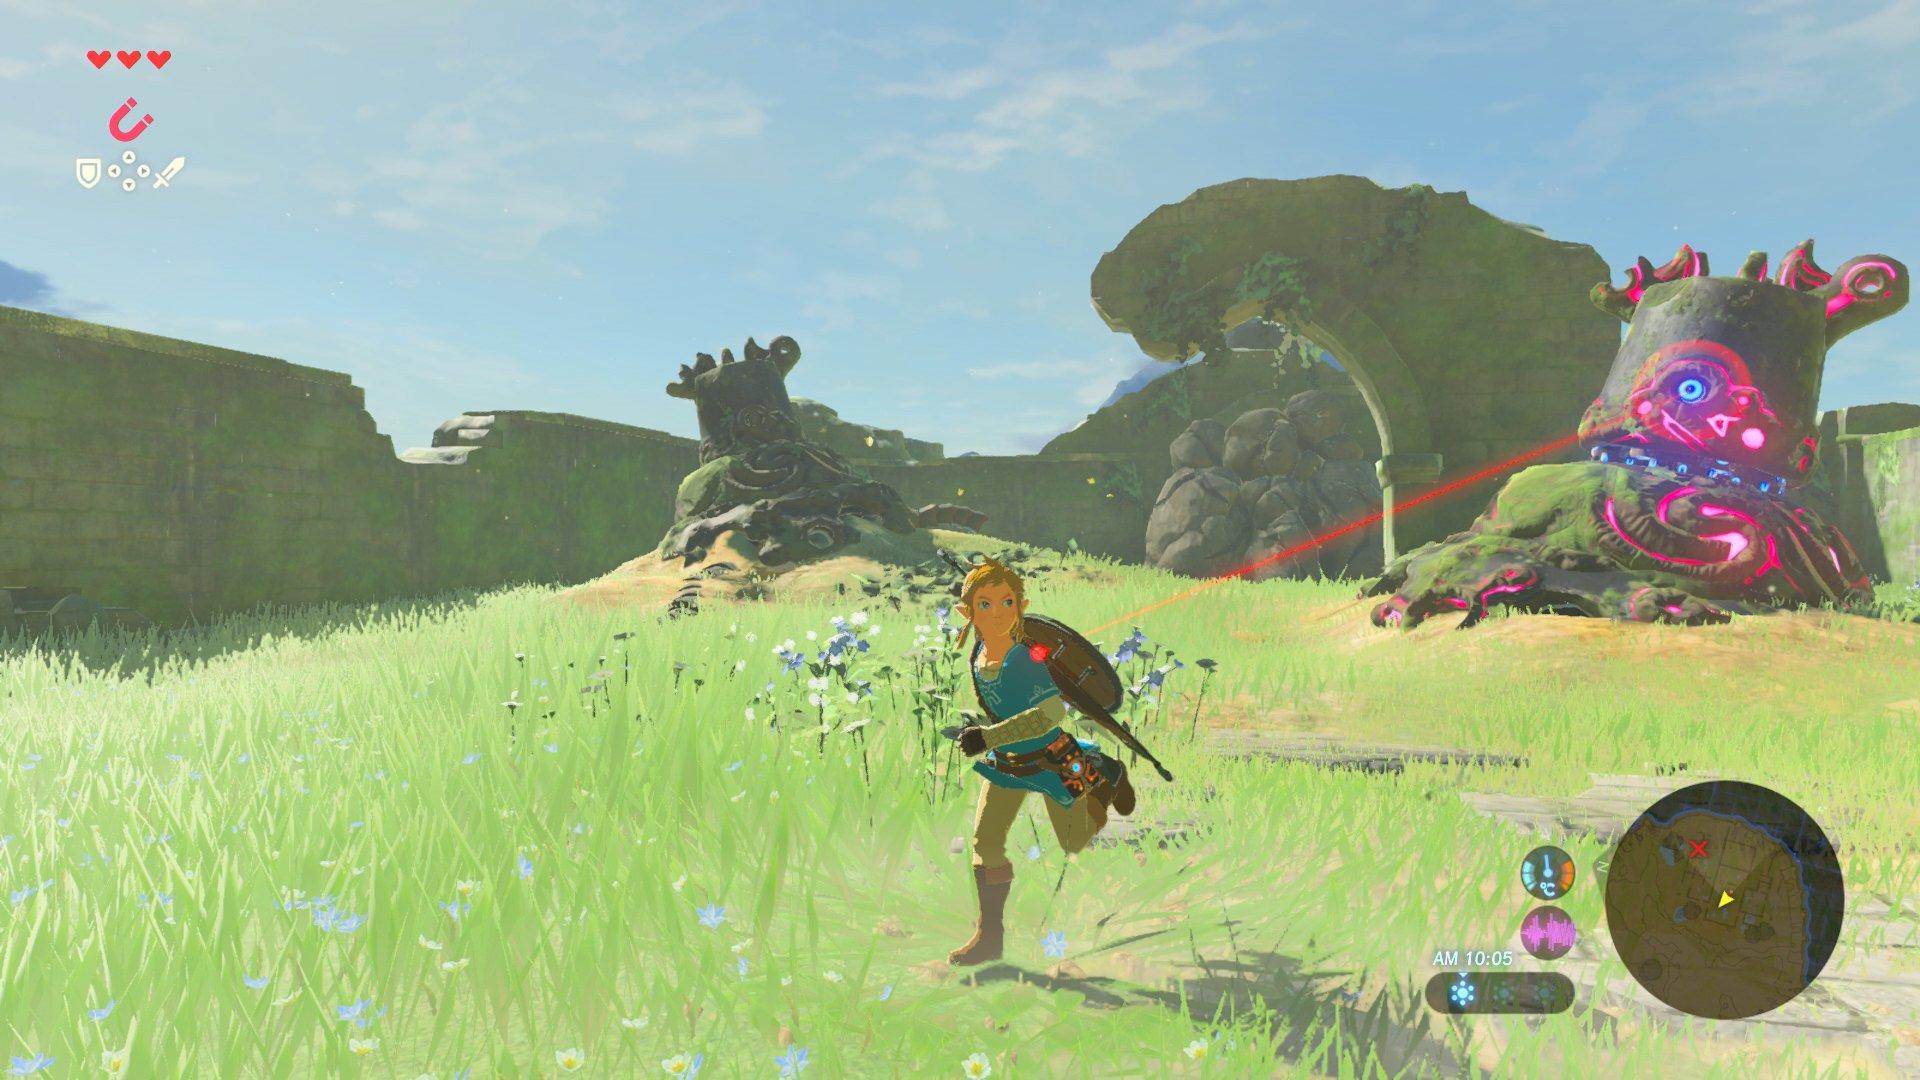 Nové screenshoty z The Legend of Zelda: Breath of the Wild 139301